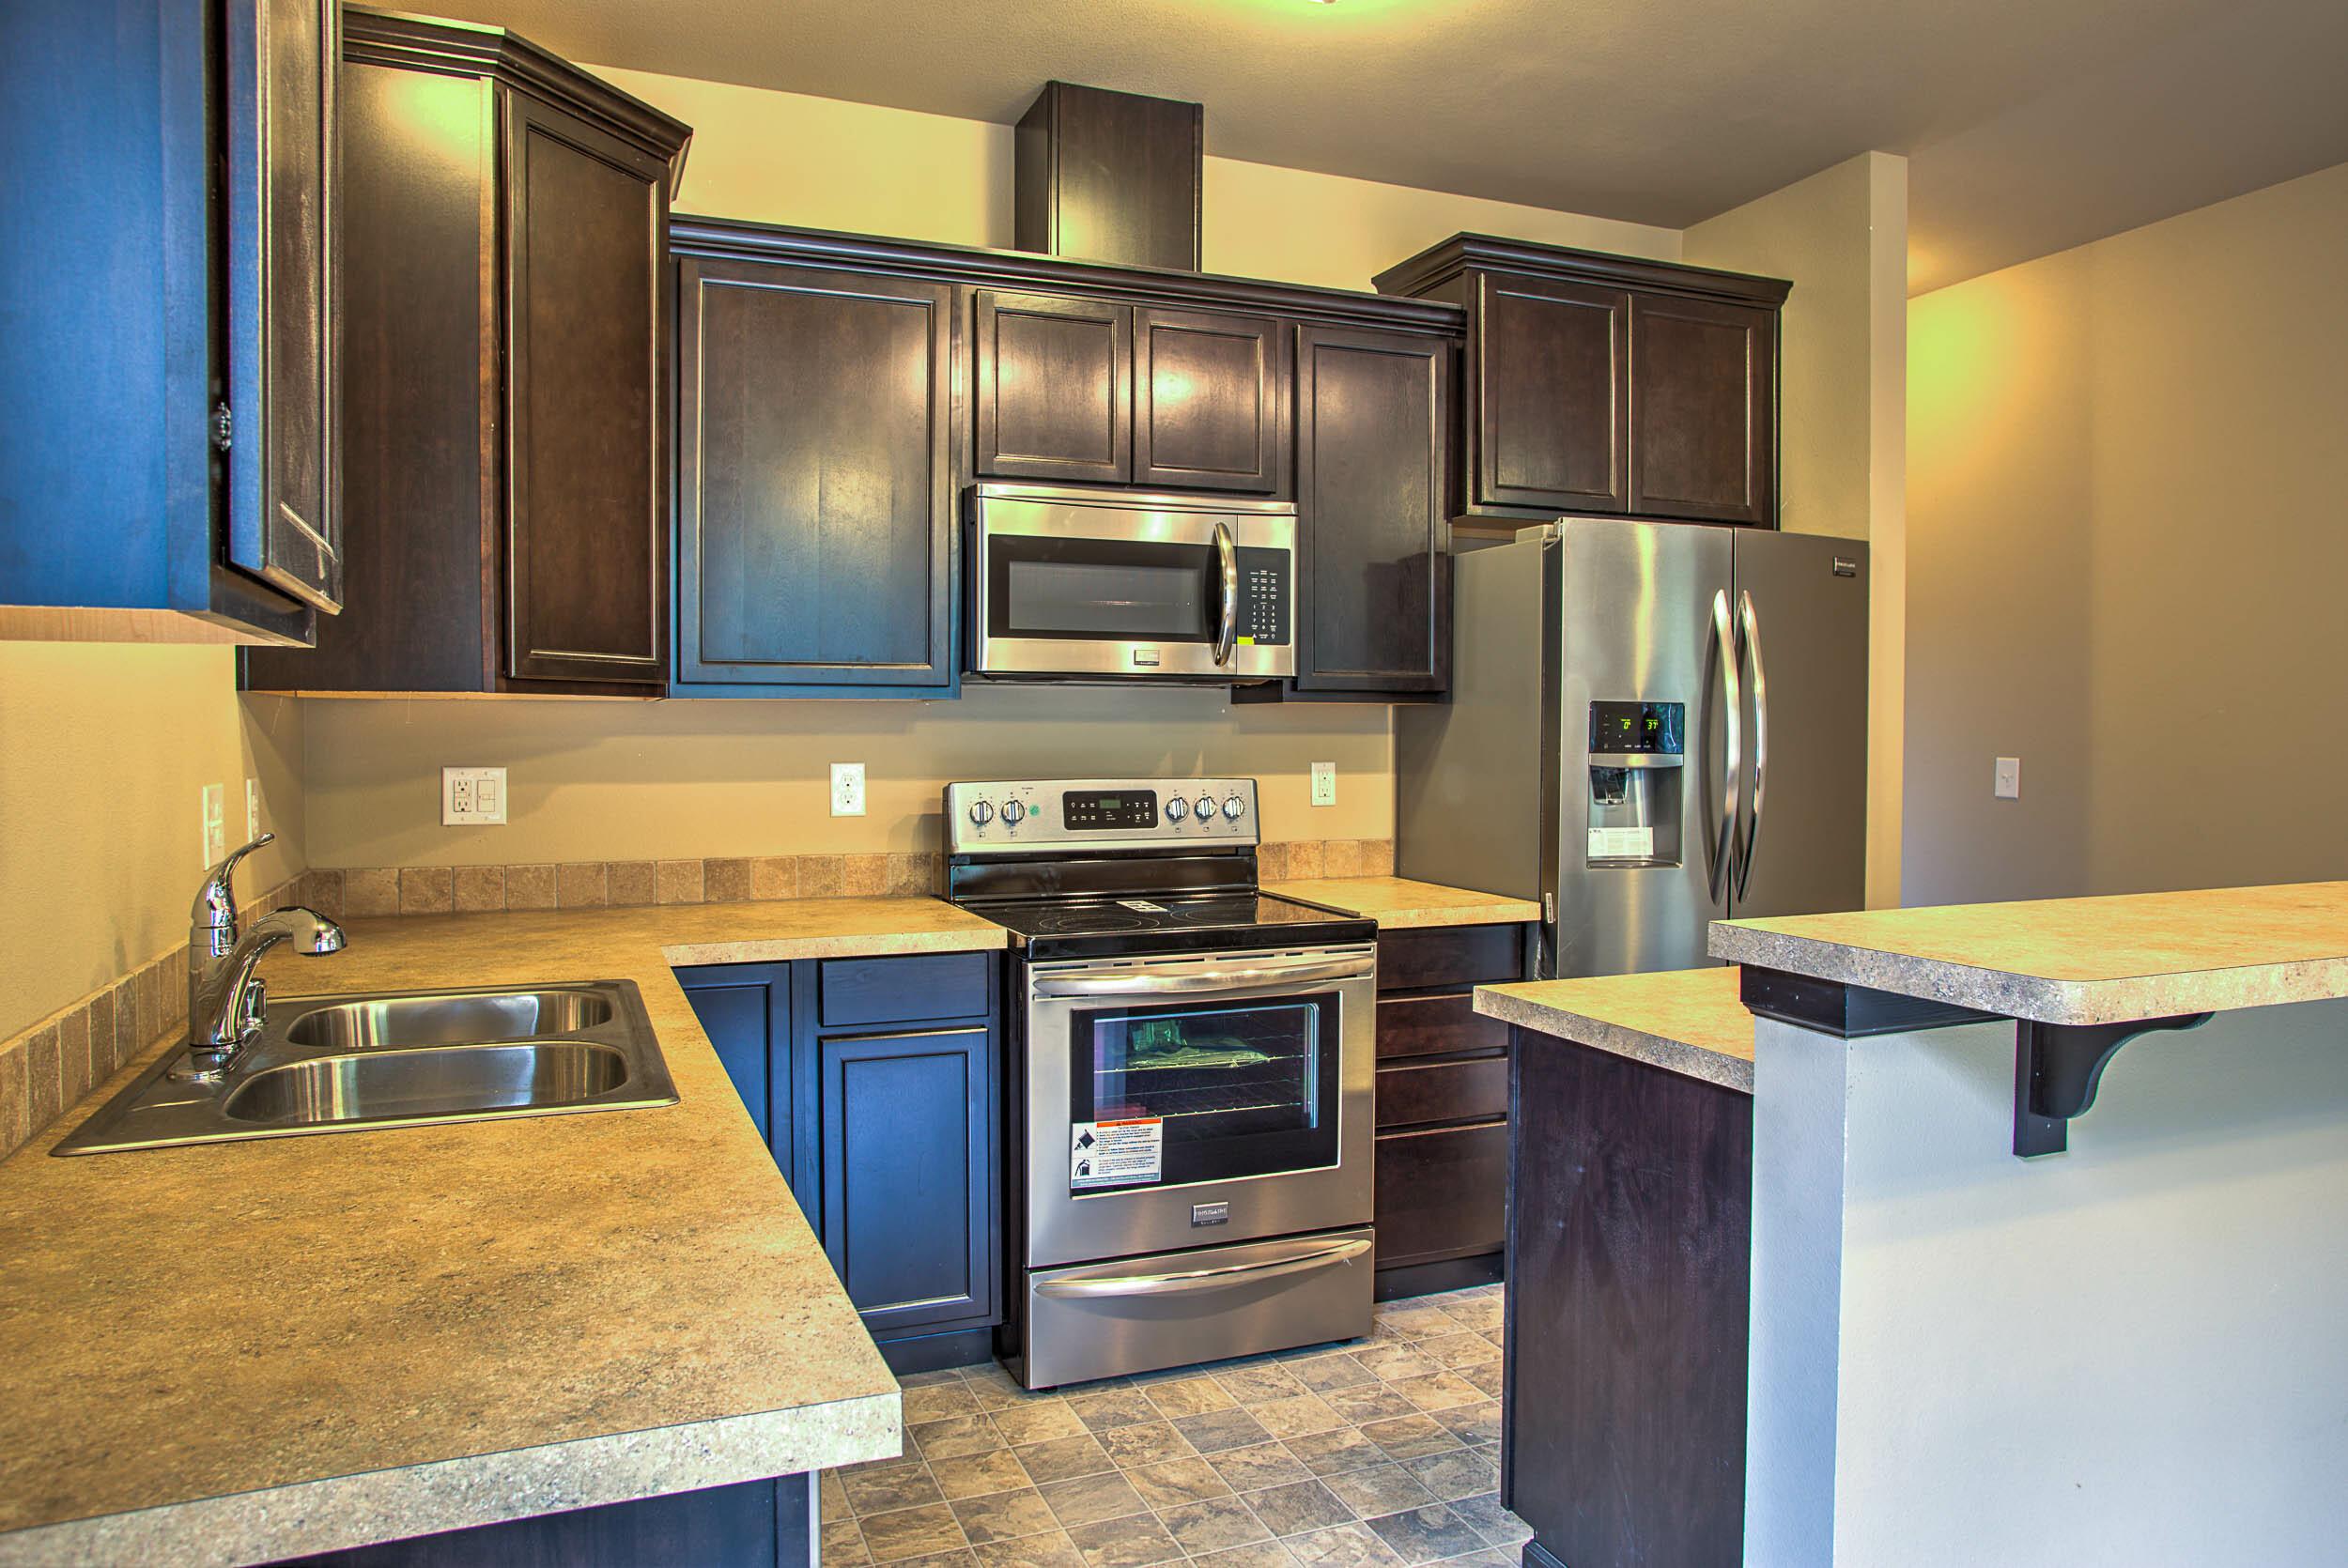 9 Foreman Rd, Mccleary, WA - USA (photo 1)